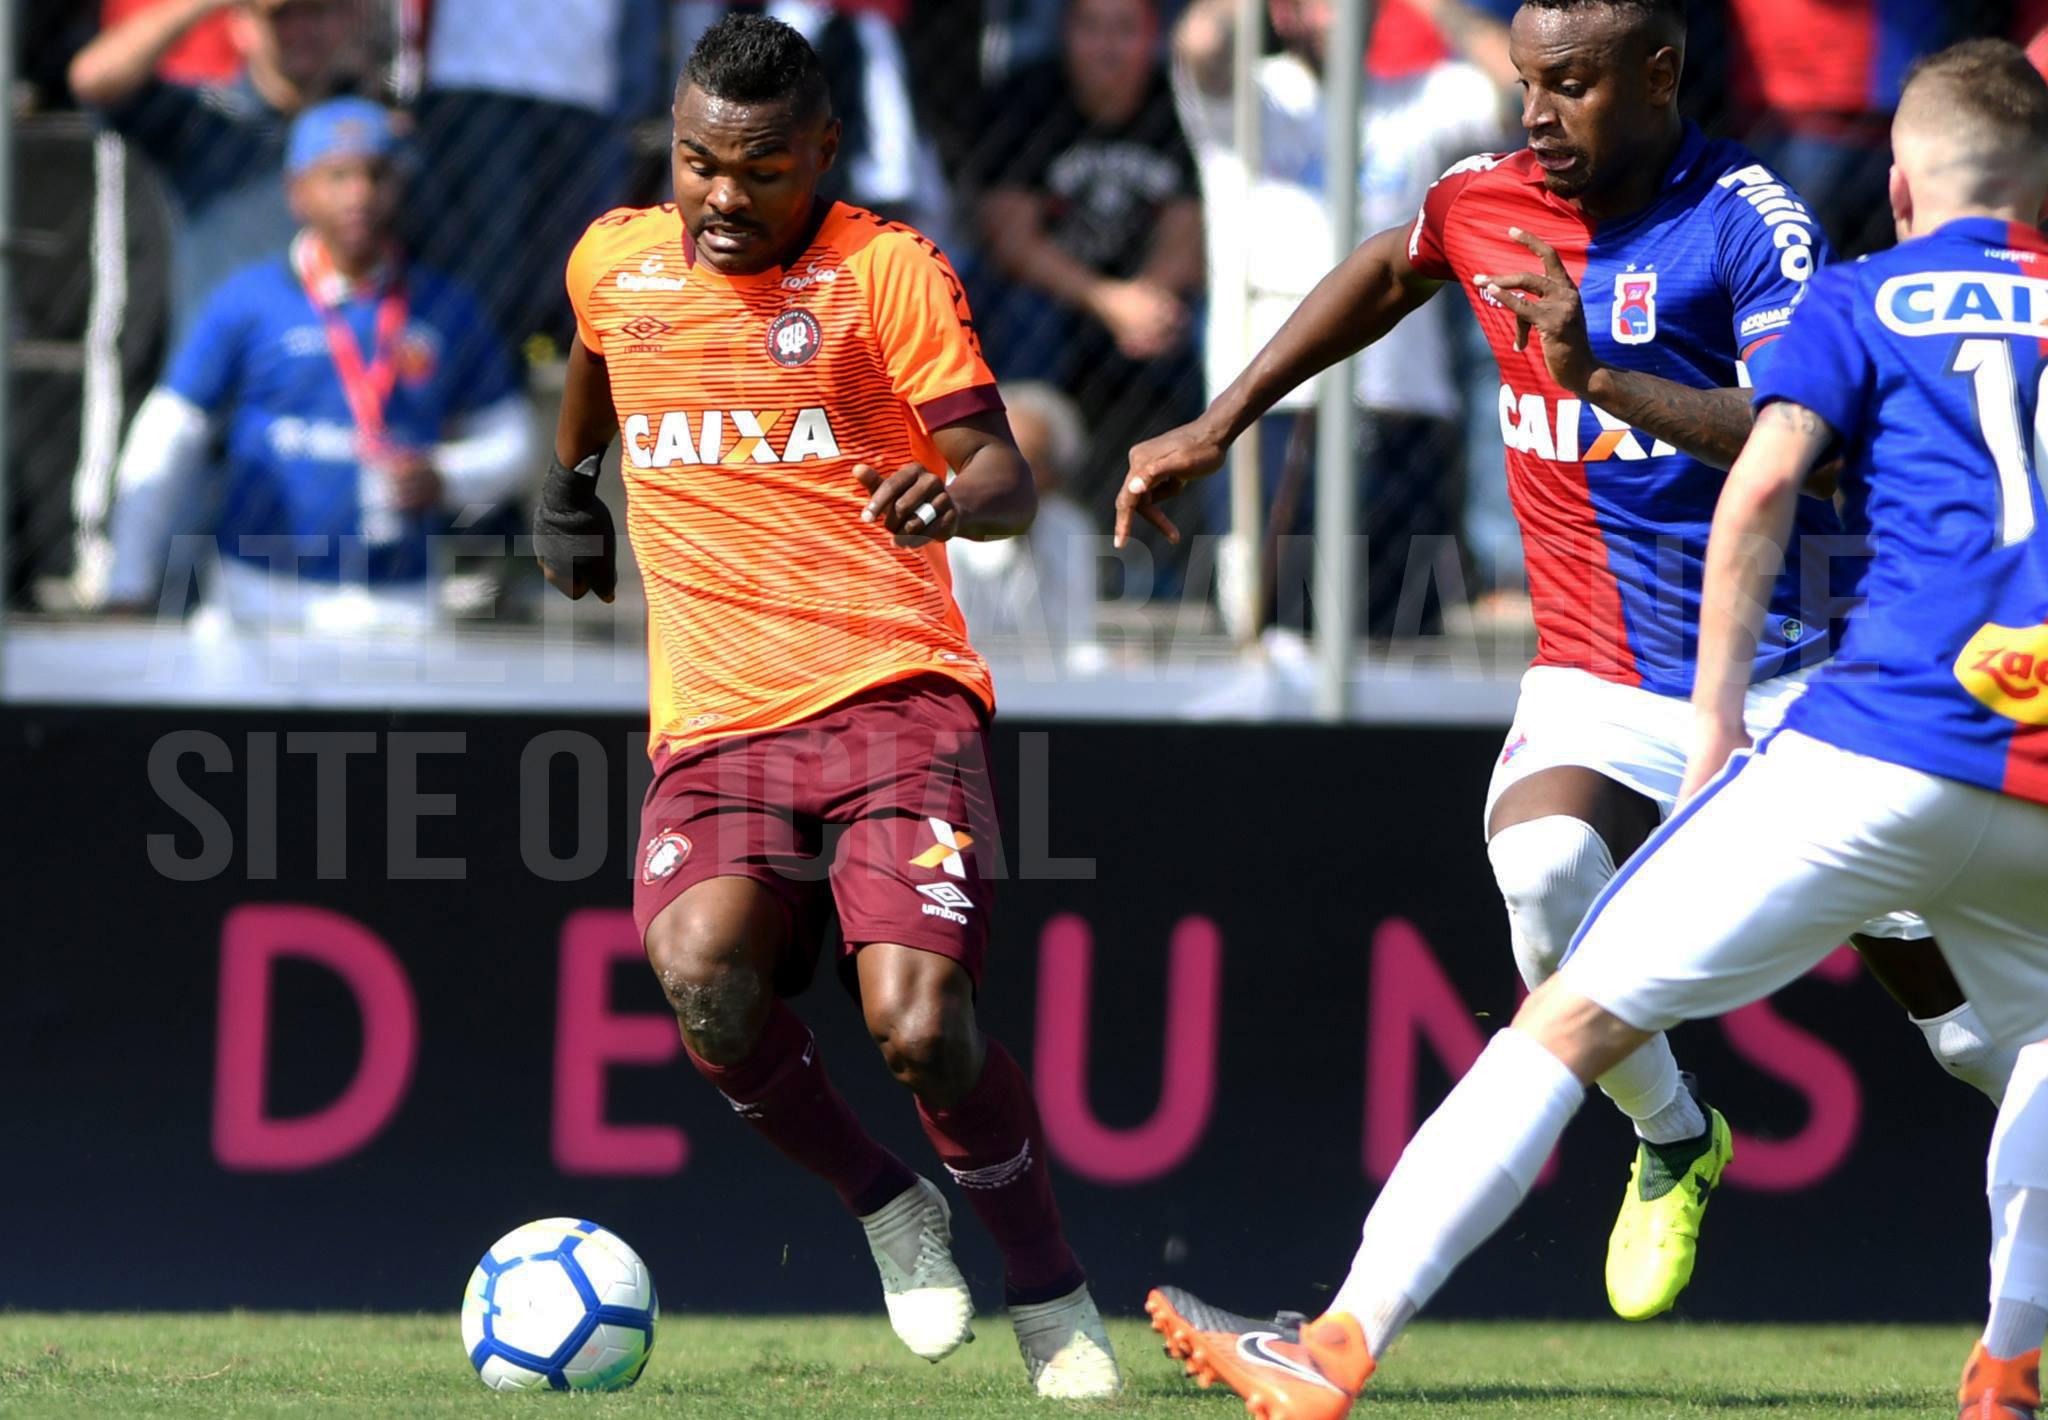 5e2be0126f619 Athletico Paranaense – Site Oficial » De volta ao time após cirurgia ...